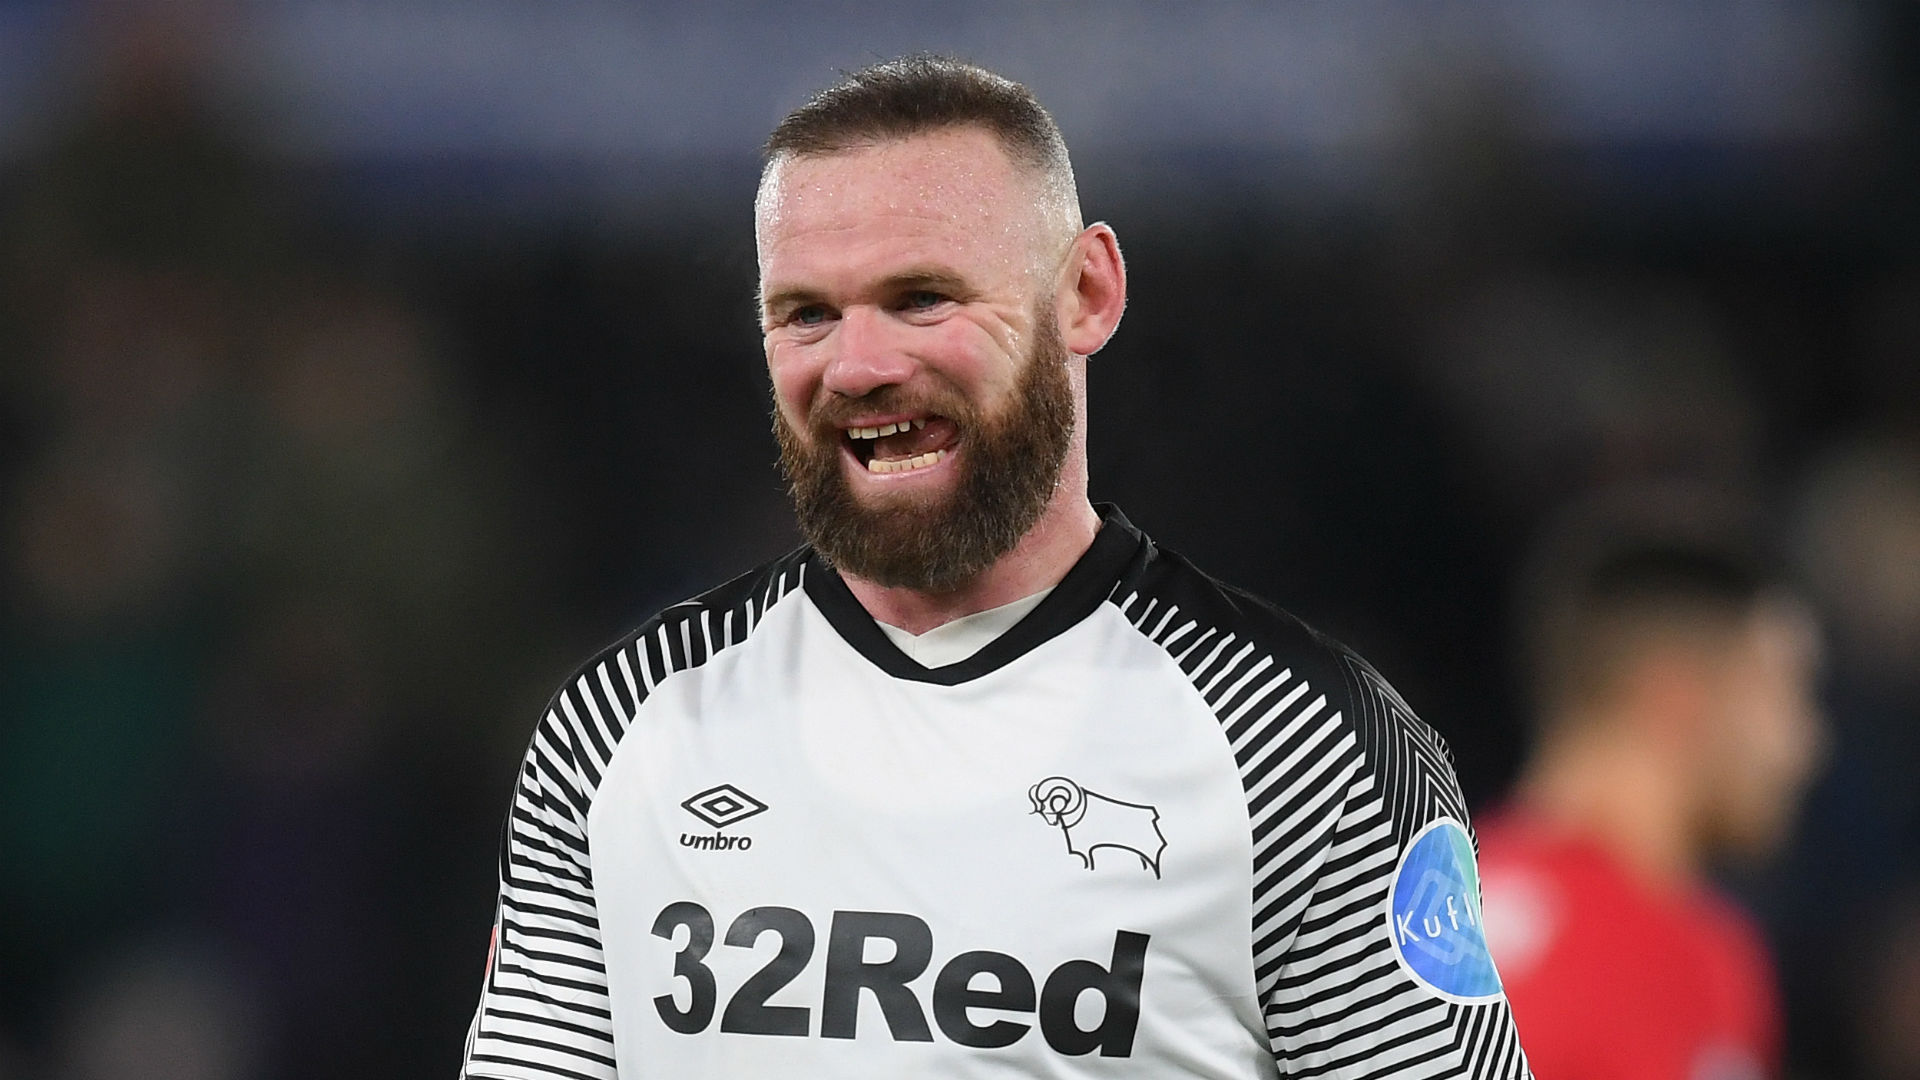 Coronavirus: Players were being treated like guinea pigs, claims Wayne Rooney